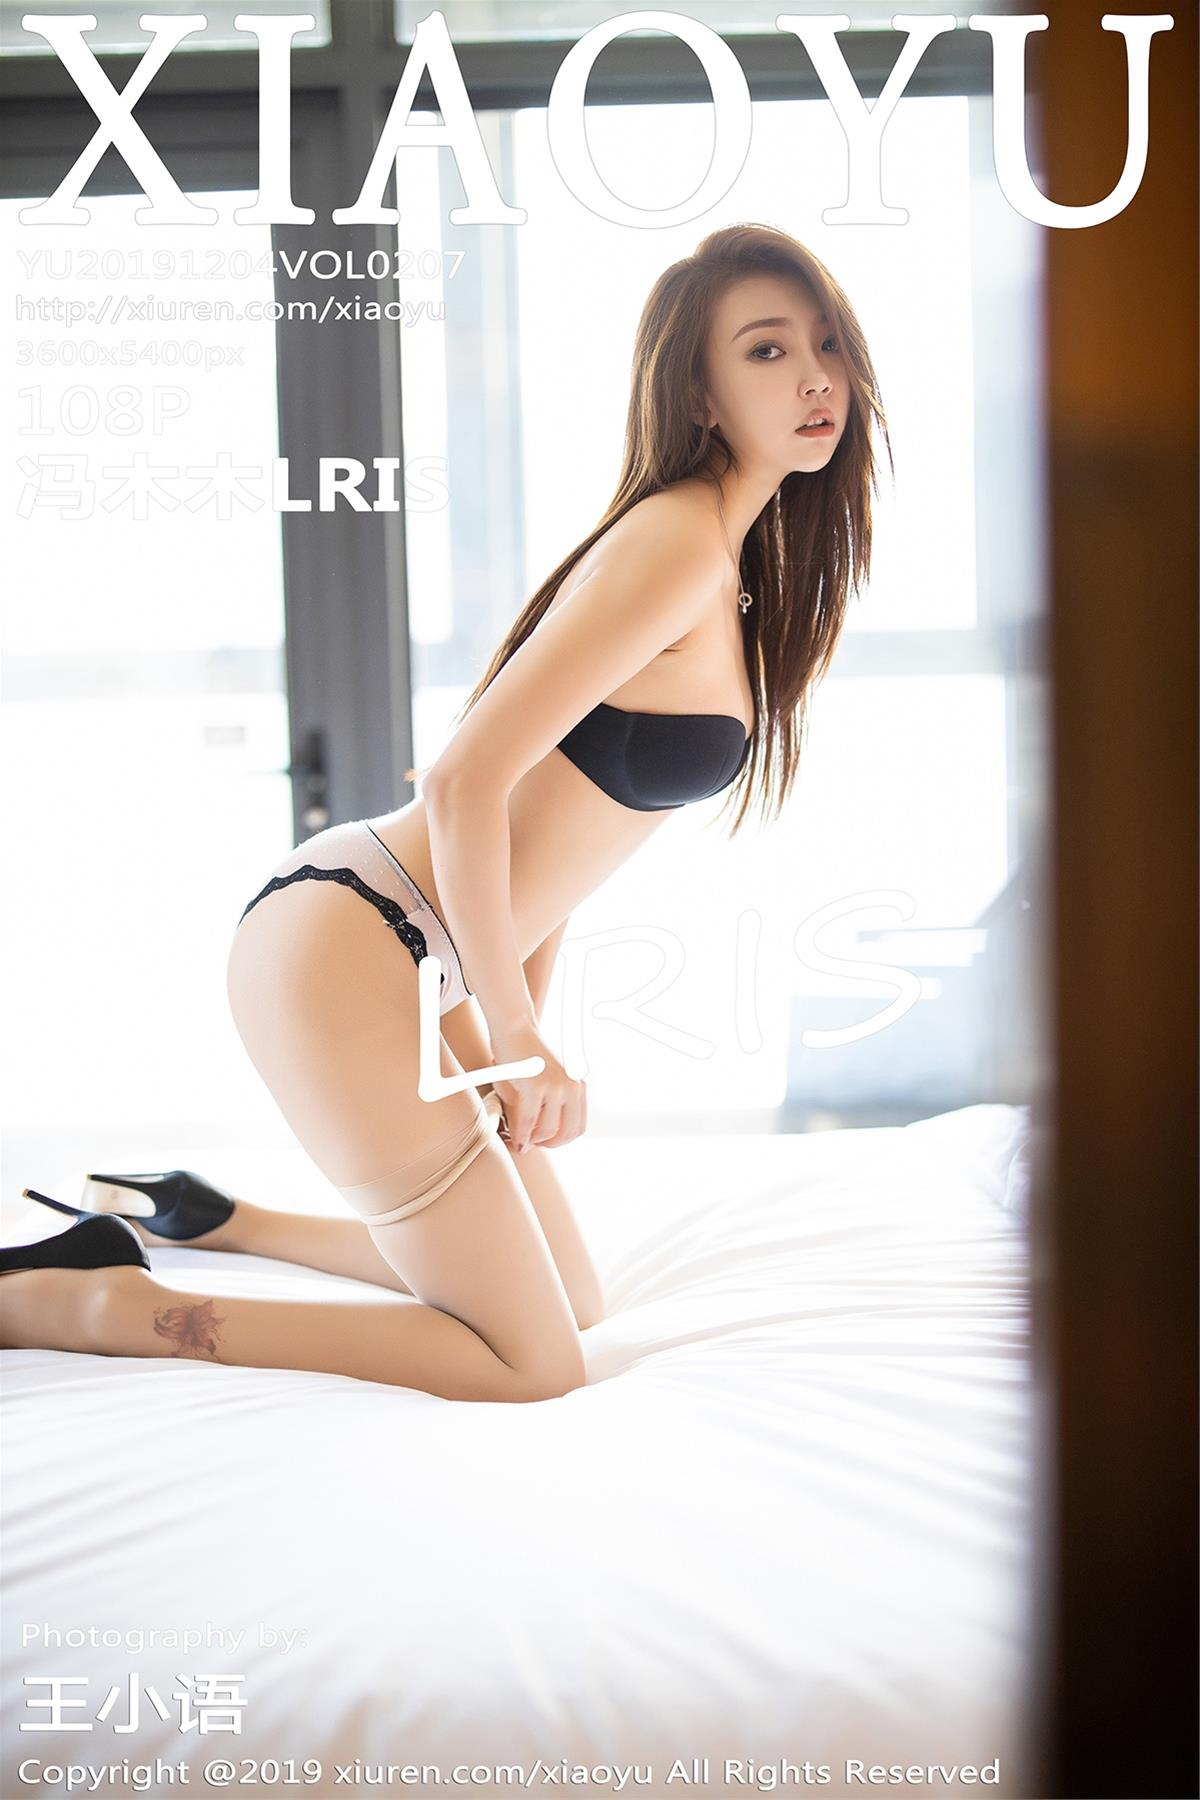 [XIAOYU] 语画界 2019.12.04 VOL.207 冯木木LRIS [108P-234MB] 人气女神-第1张